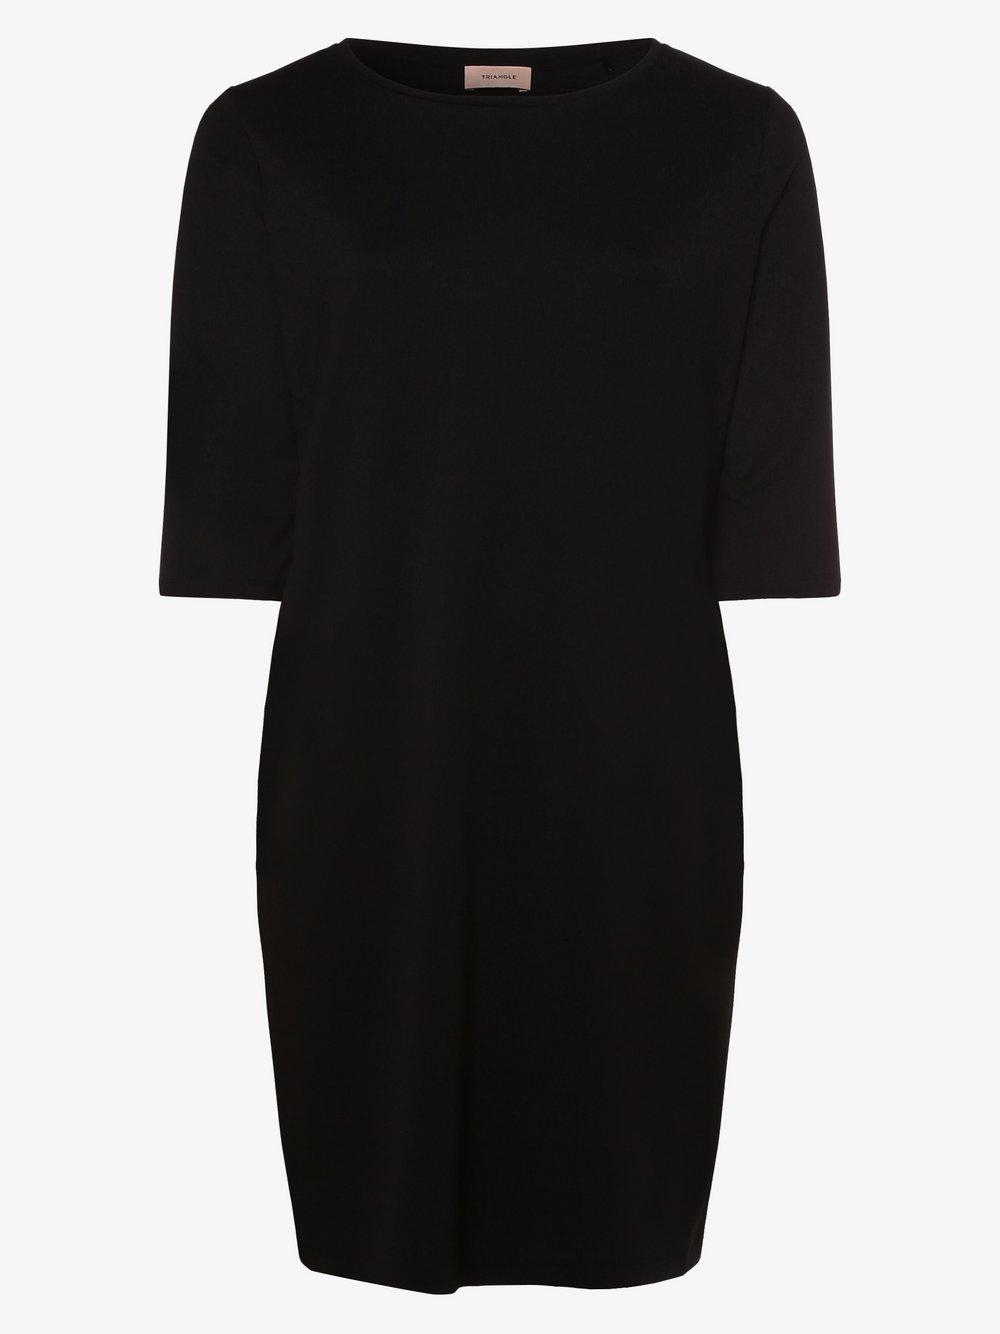 TRIANGLE - Sukienka damska, czarny